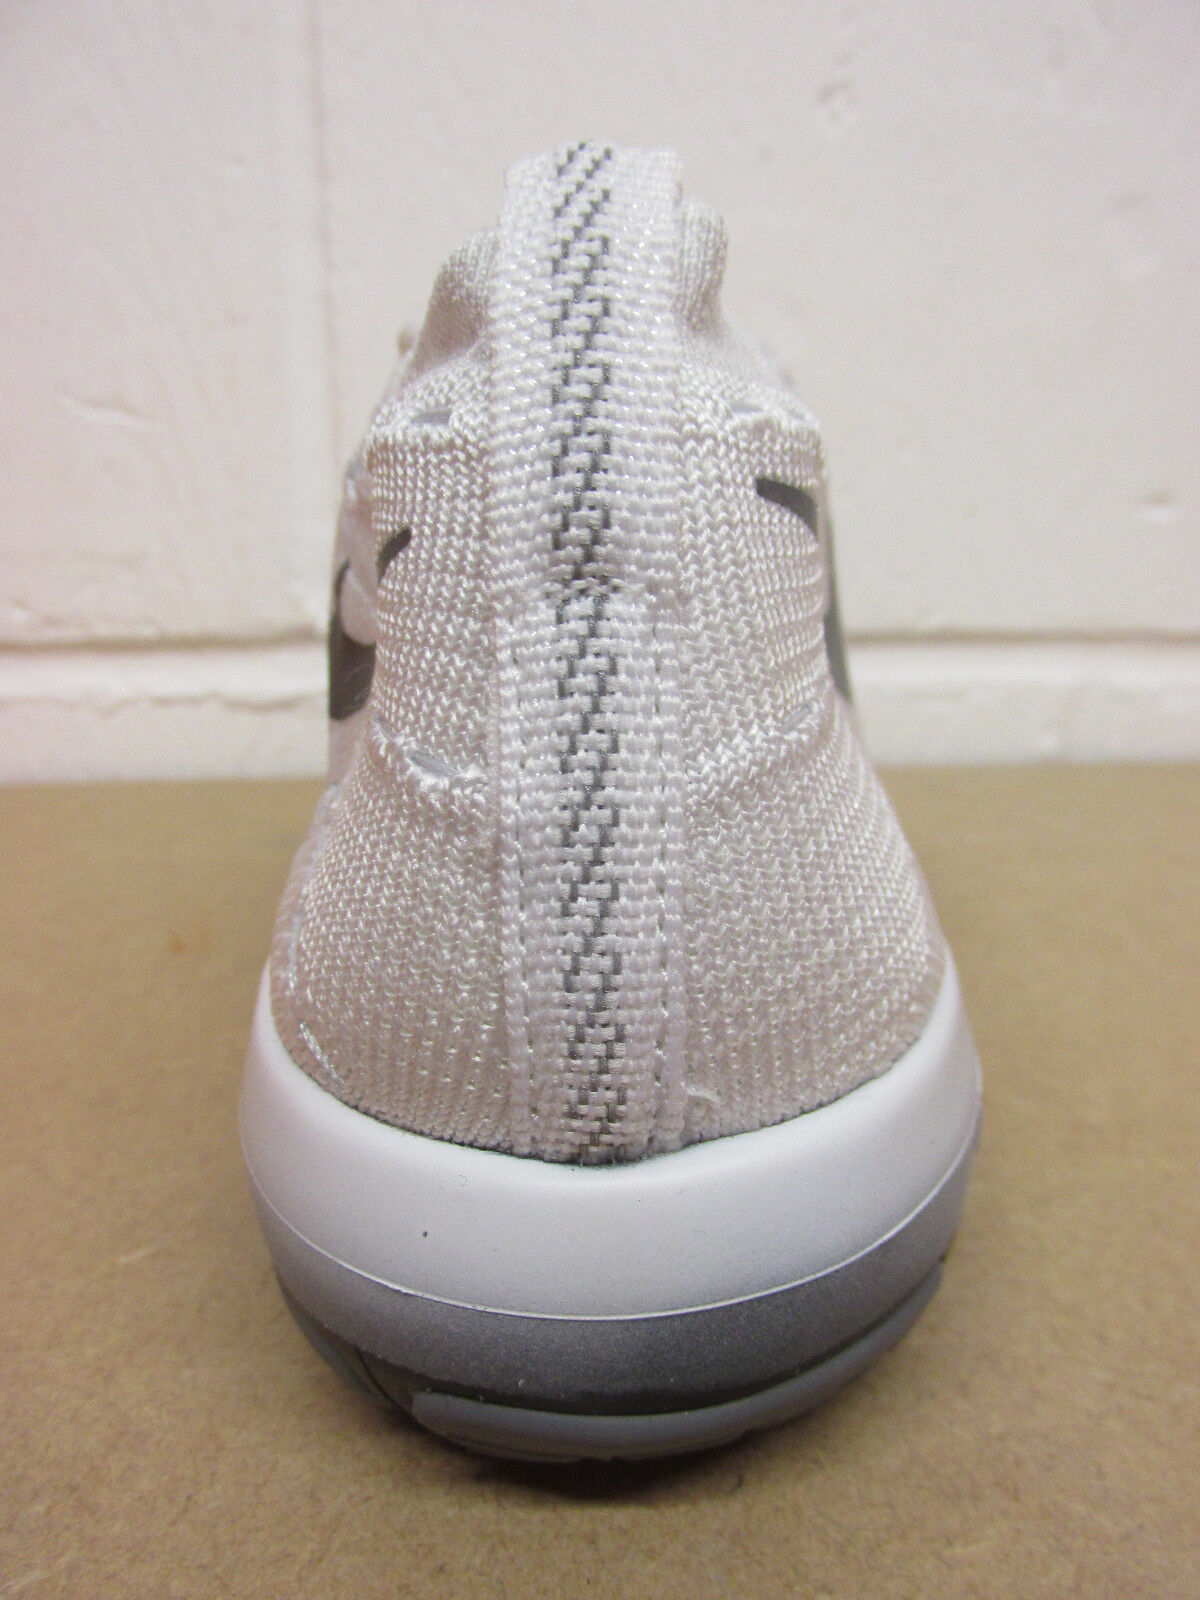 Nike Free Transform Flyknit 101 Damenschuhe Running Trainers 833410 101 Flyknit Sneakers Schuhes 11b400